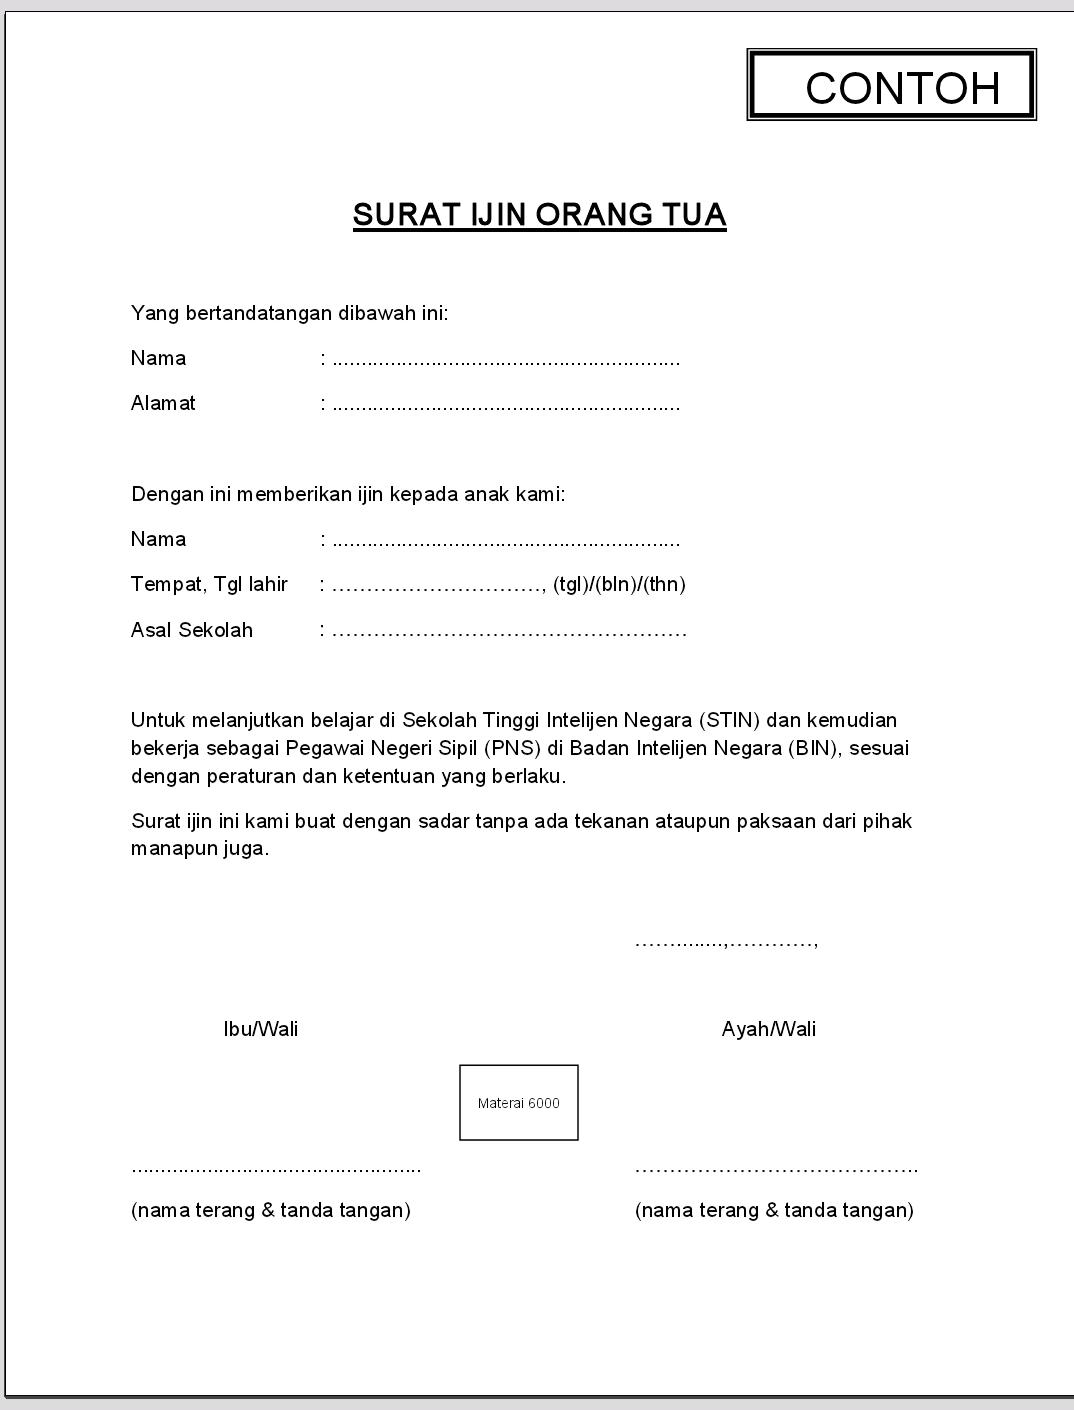 Contoh Surat Izin Orang Tua - Assalam Print